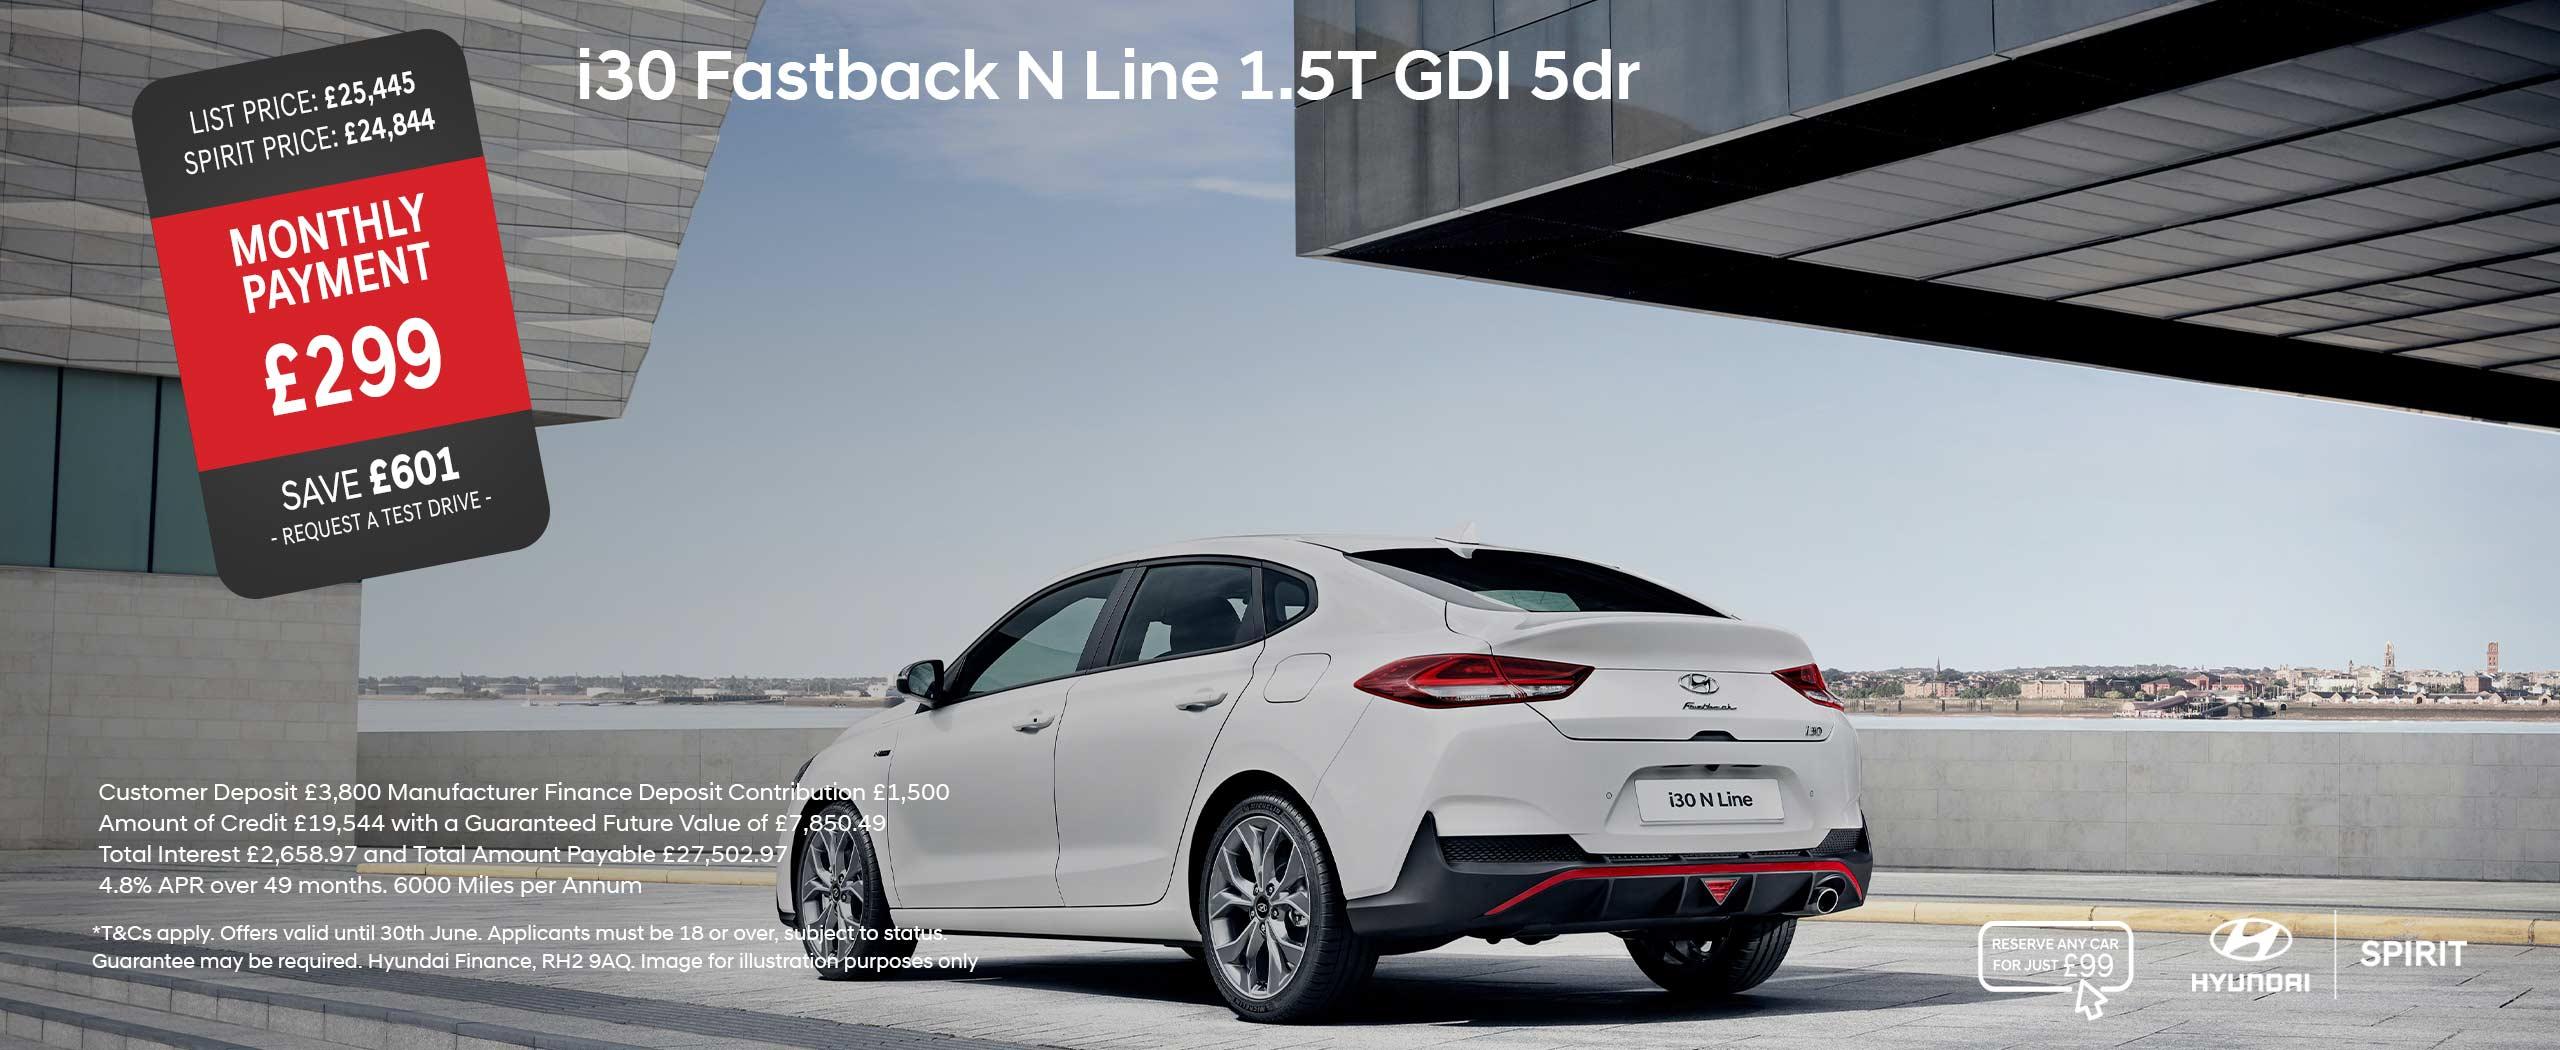 i30 Fastback